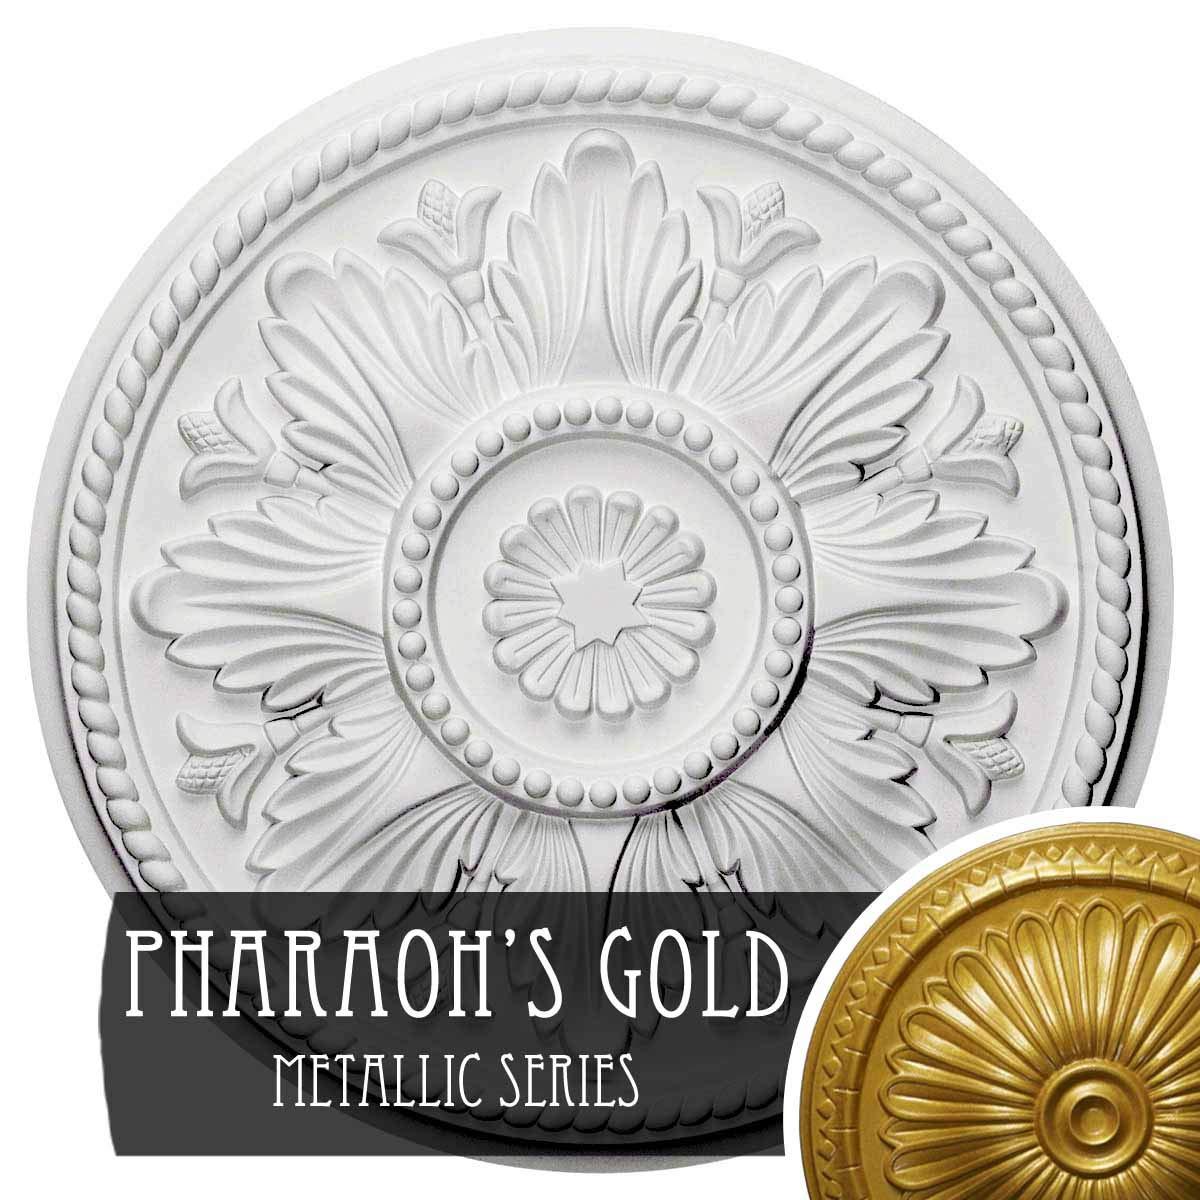 Ekena Millwork CM18EDPGS Edinburgh Ceiling Medallion Fits Canopies Up to 5 1/4'', Pharaohs Gold